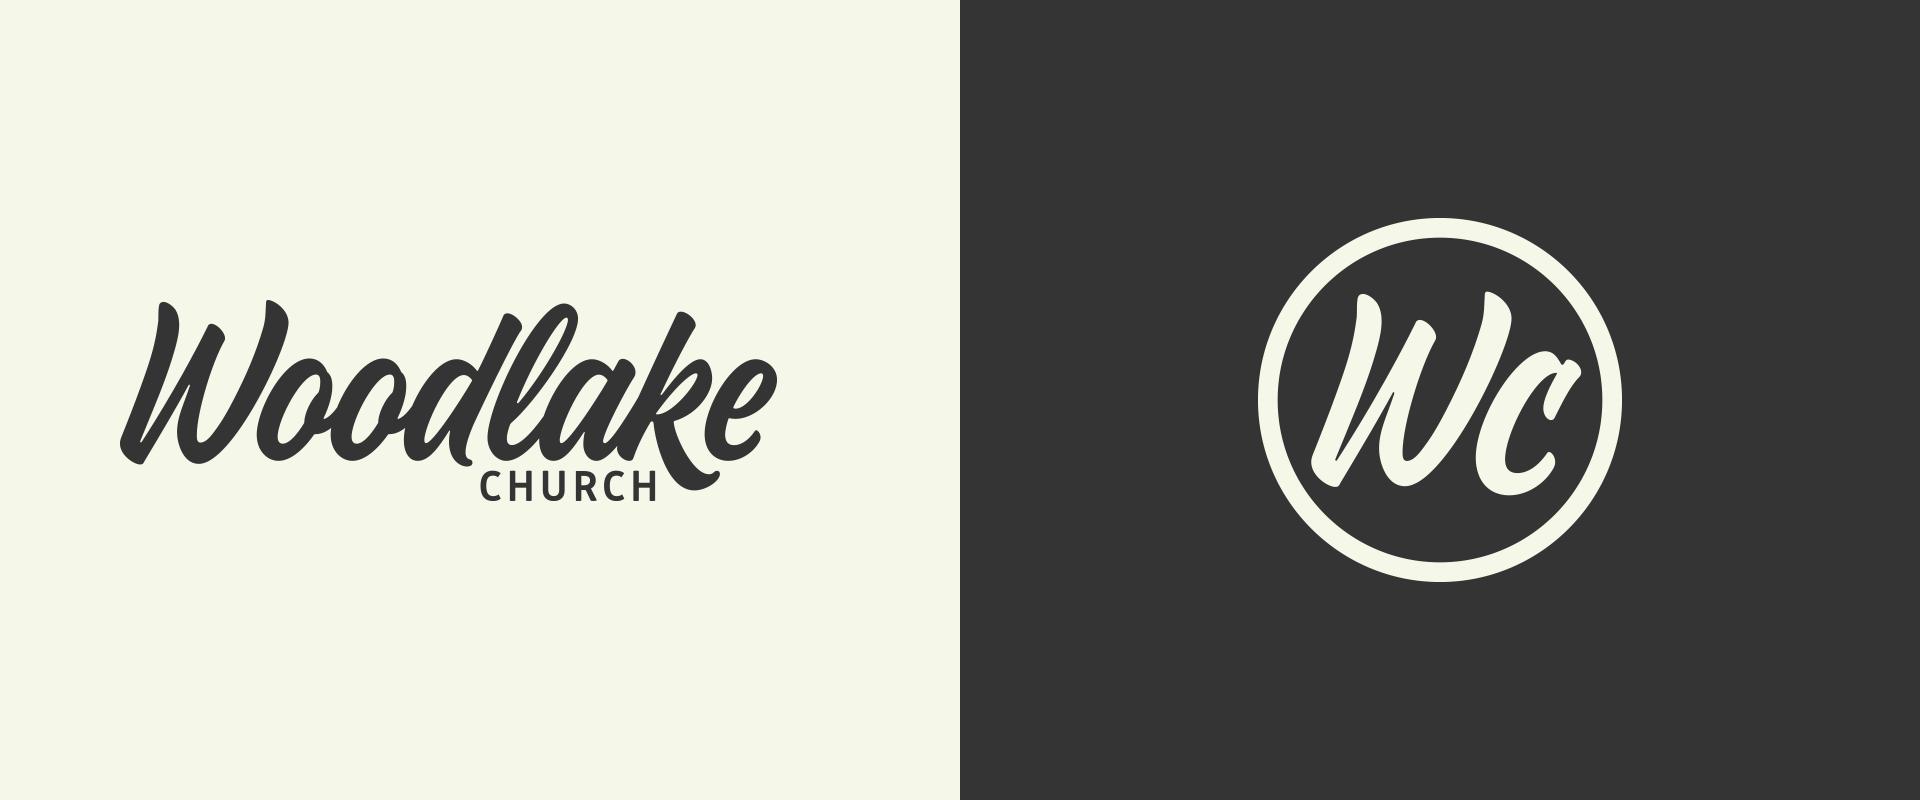 WC_logo-2.png